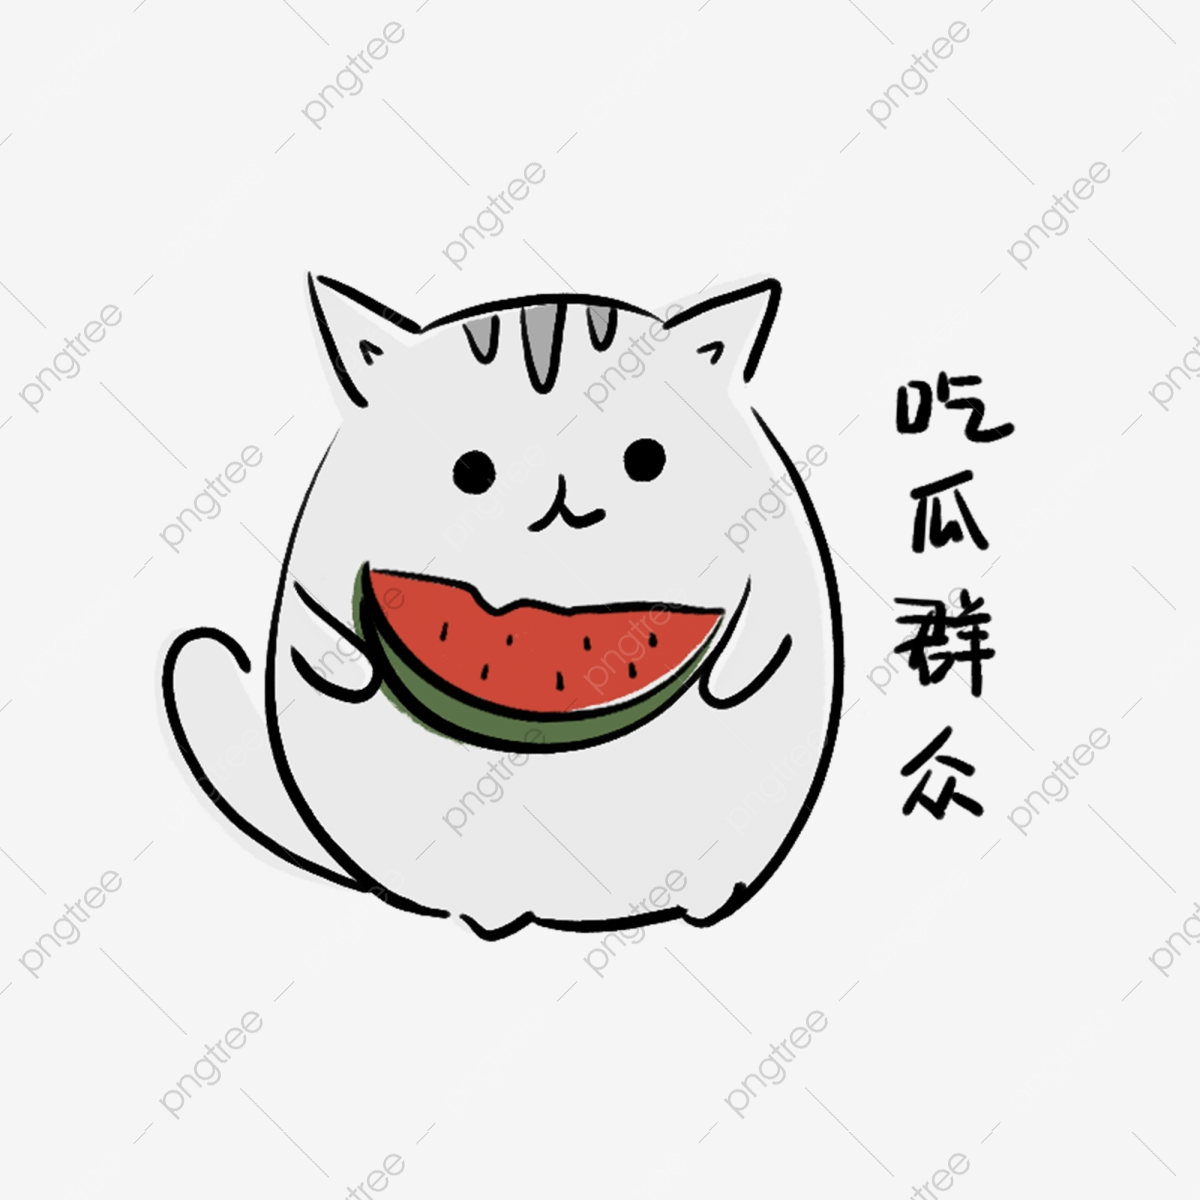 Cat Eating Melons Watermelon Short English, Hand Painted, Cartoon.